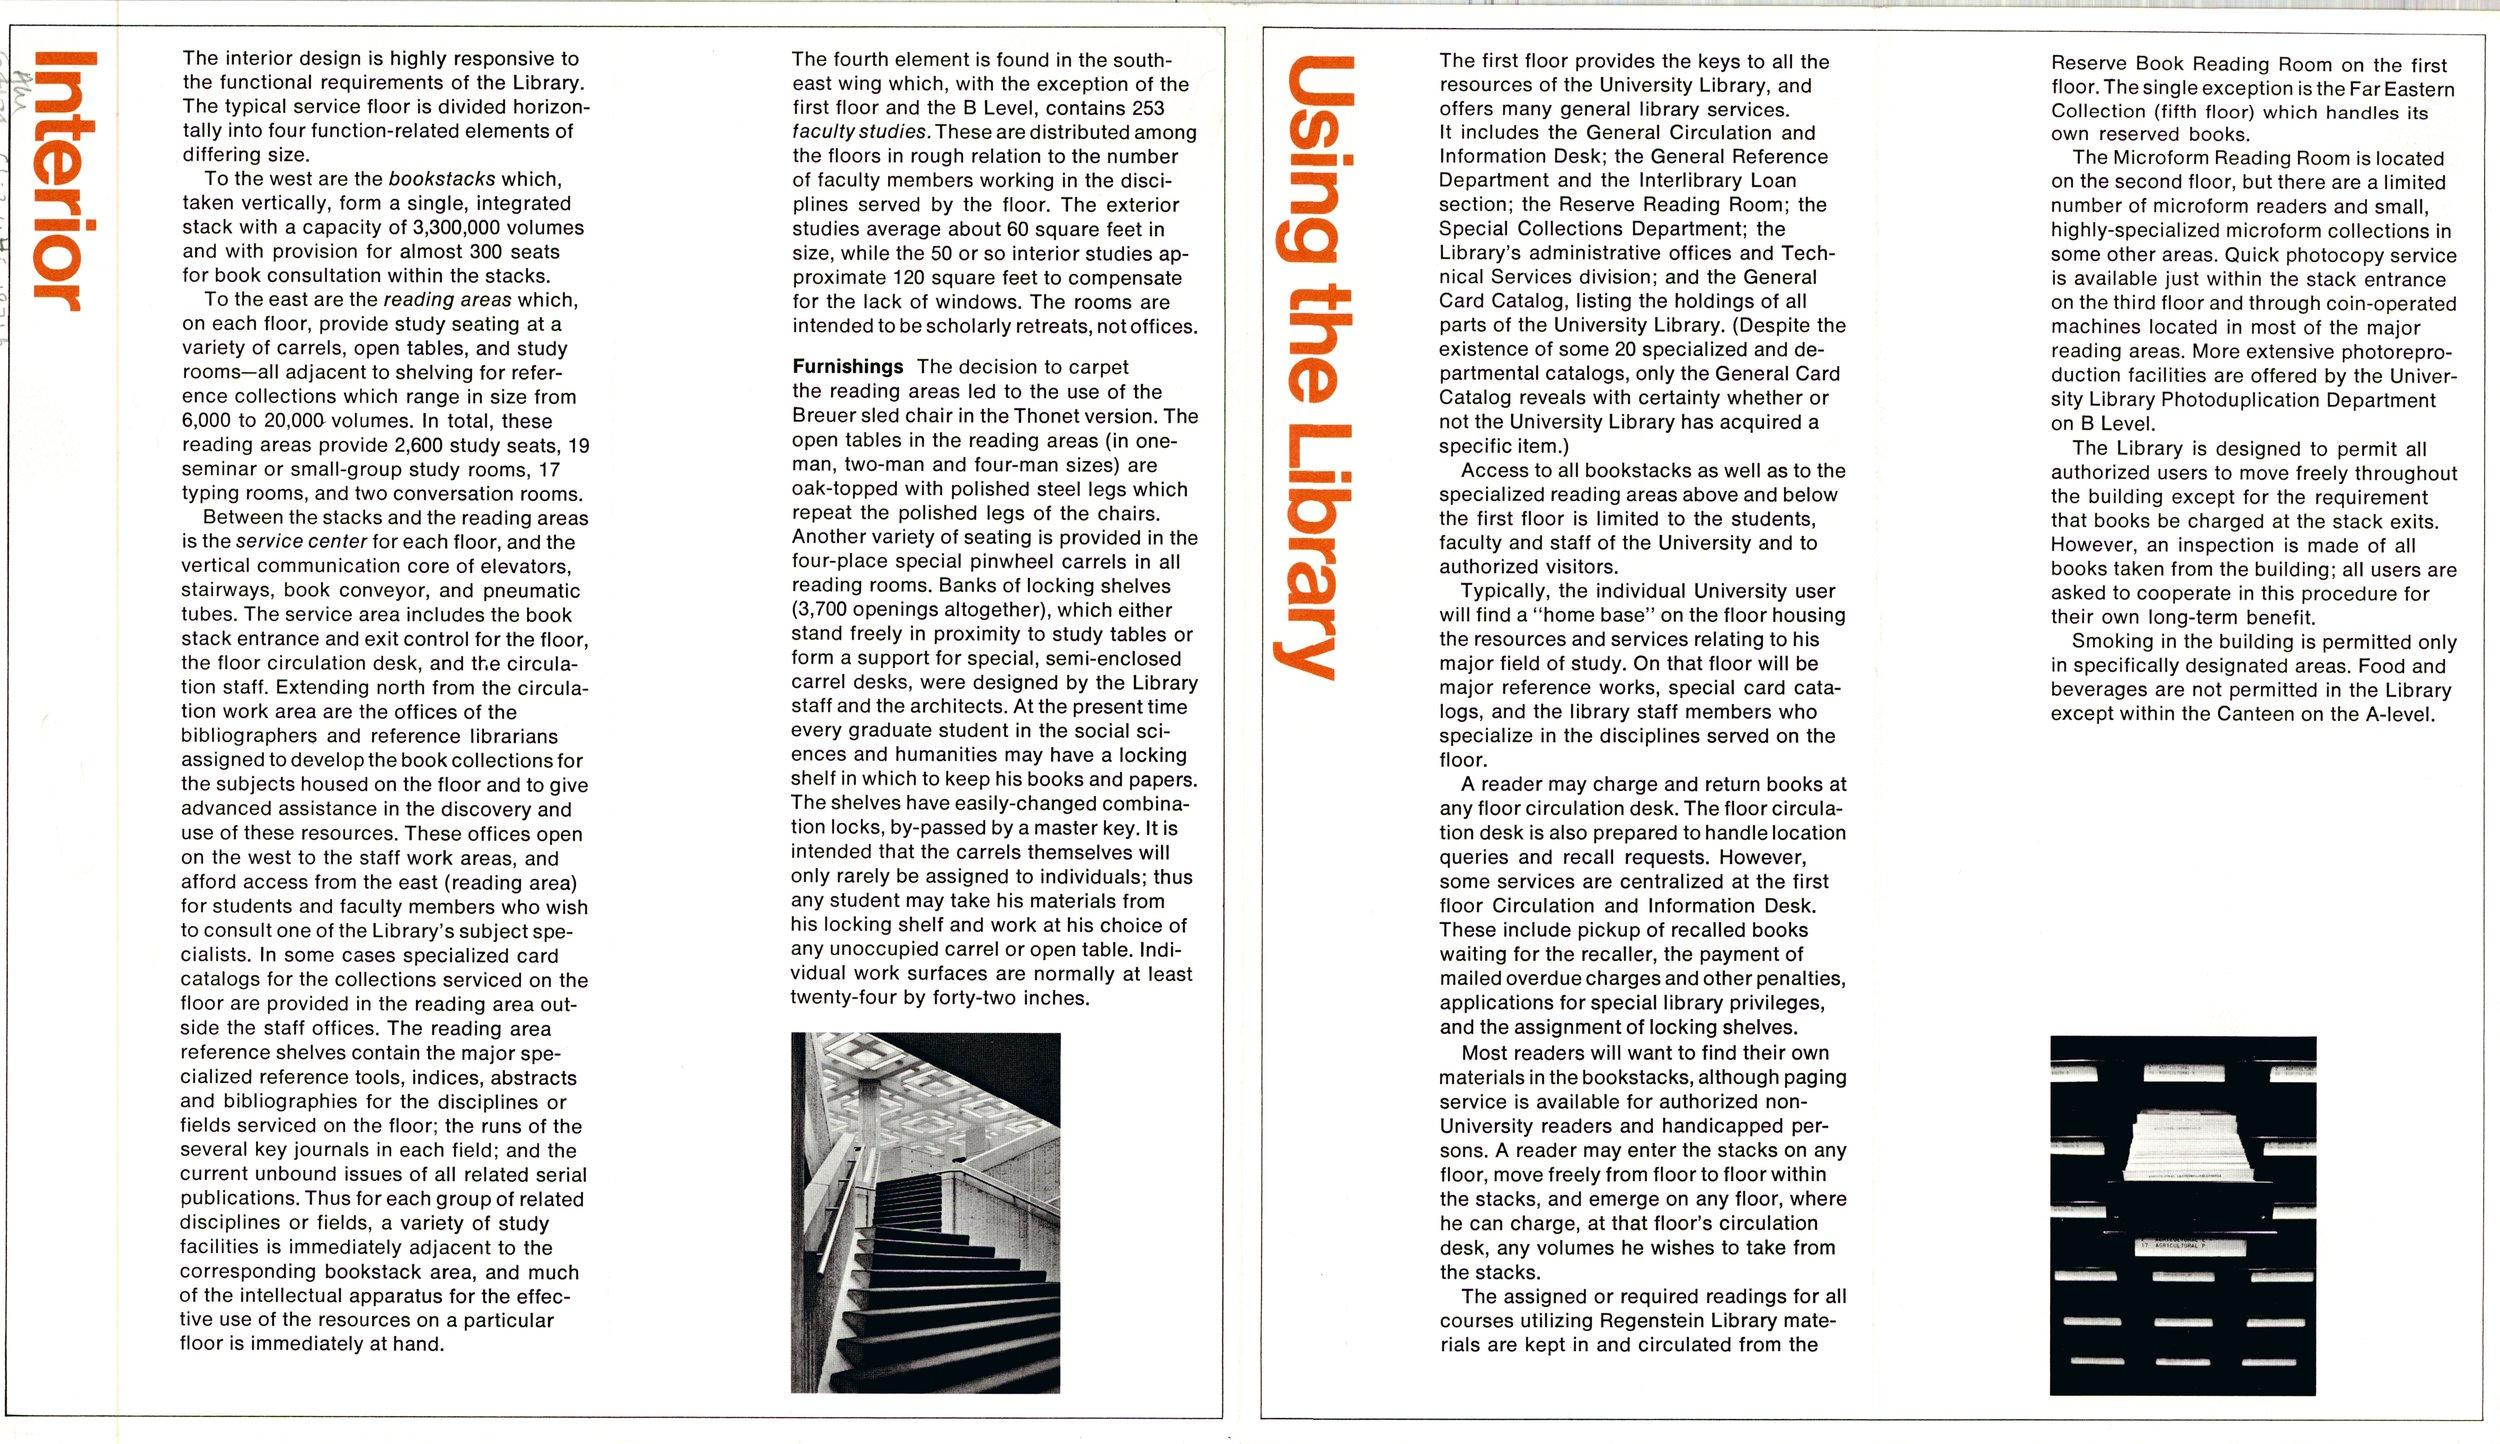 Brochure about the Joseph Regenstein Library, 1971